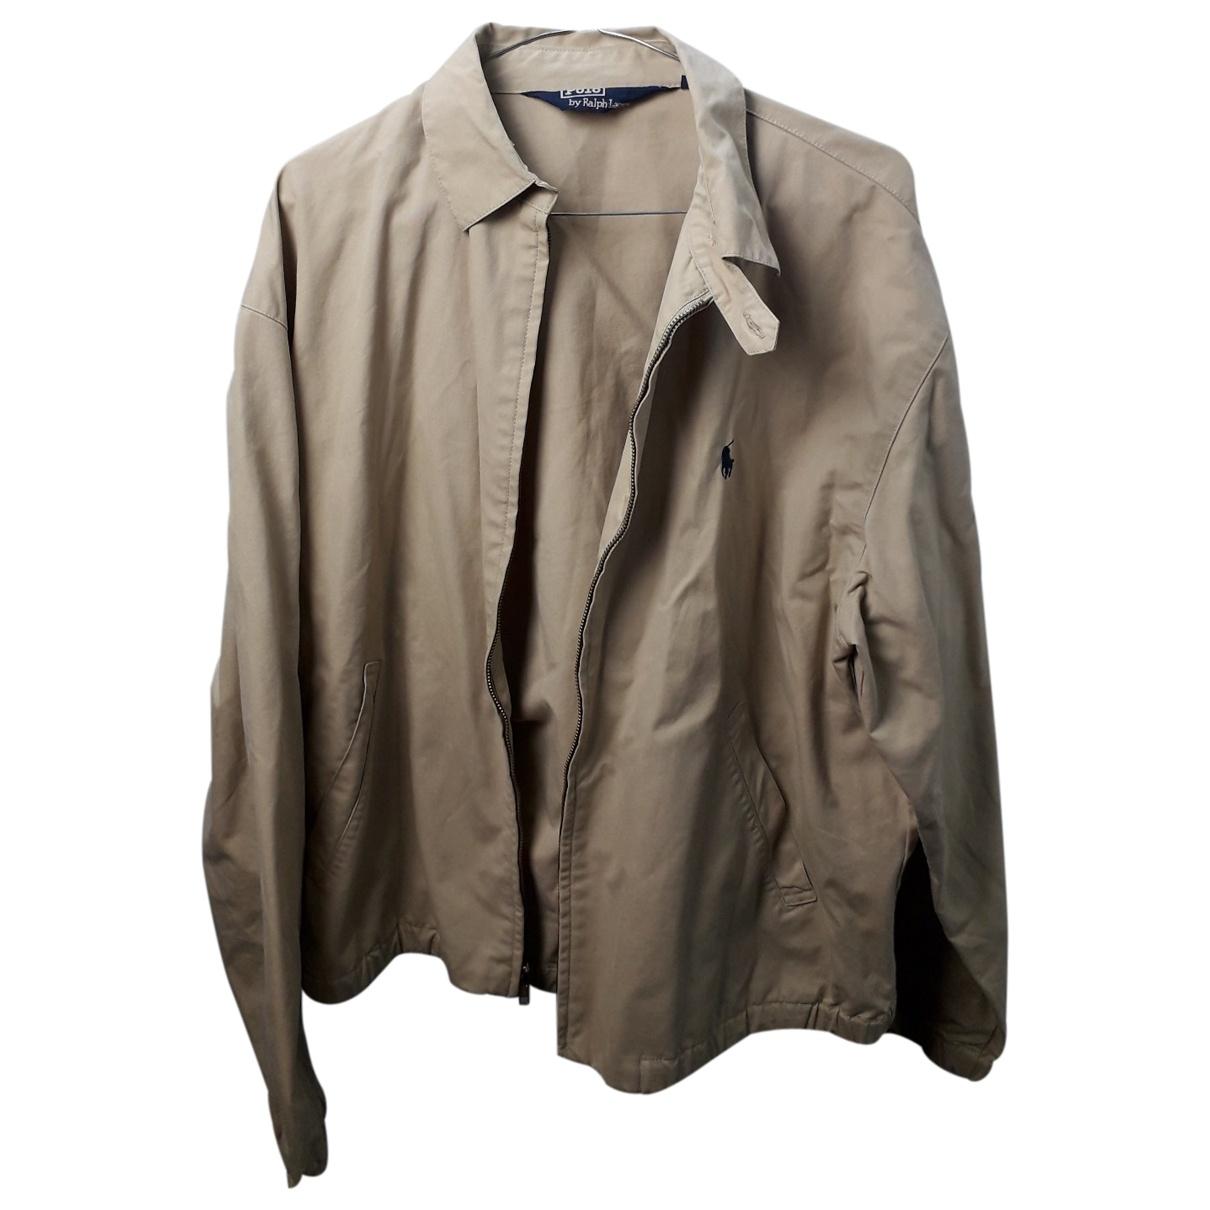 Polo Ralph Lauren \N Beige Cotton jacket  for Men M International